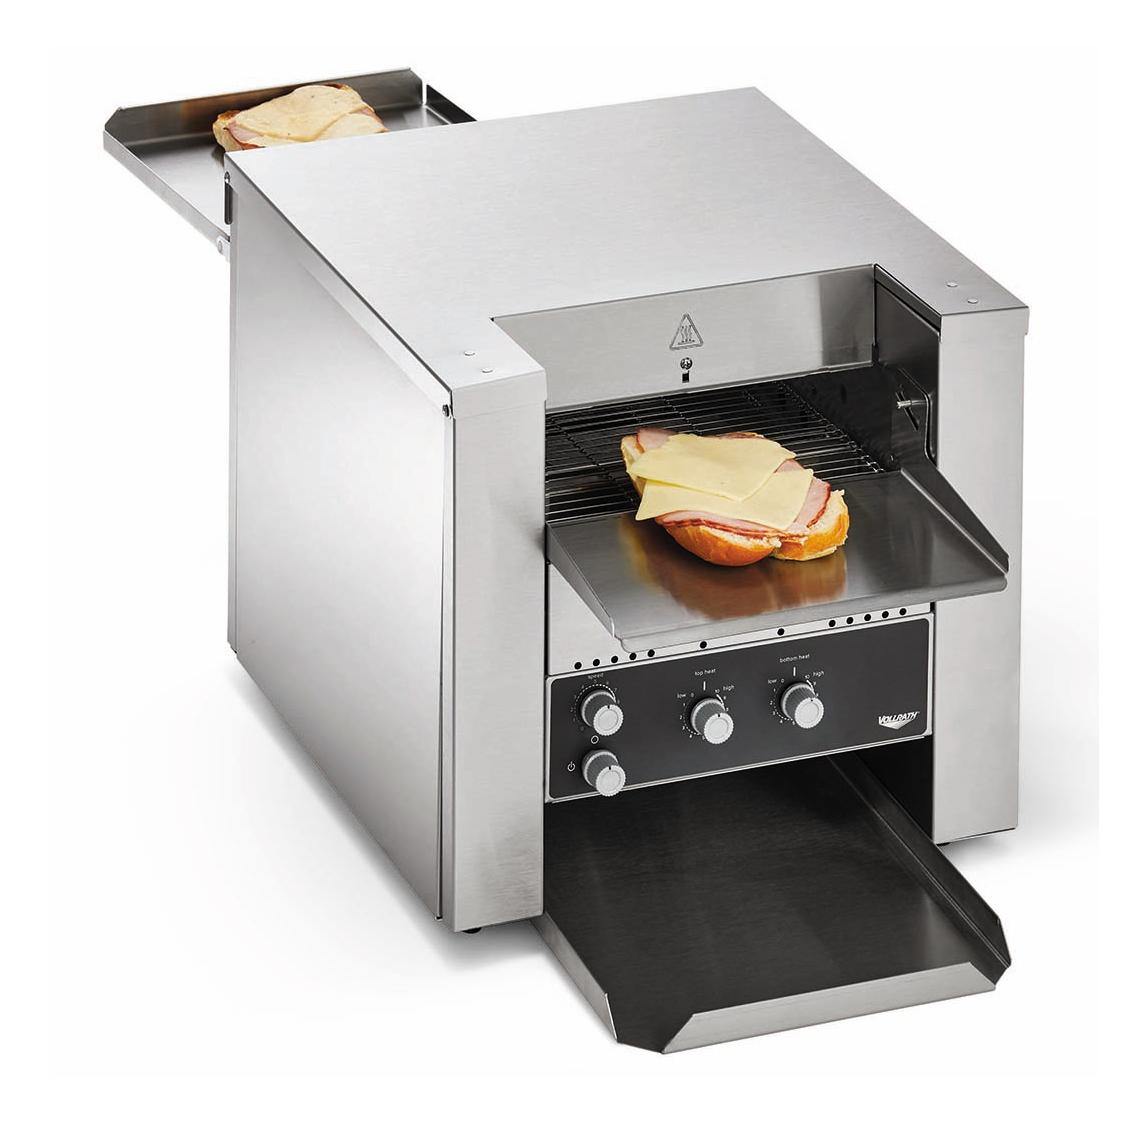 Vollrath CVT4-208550 toaster, conveyor type